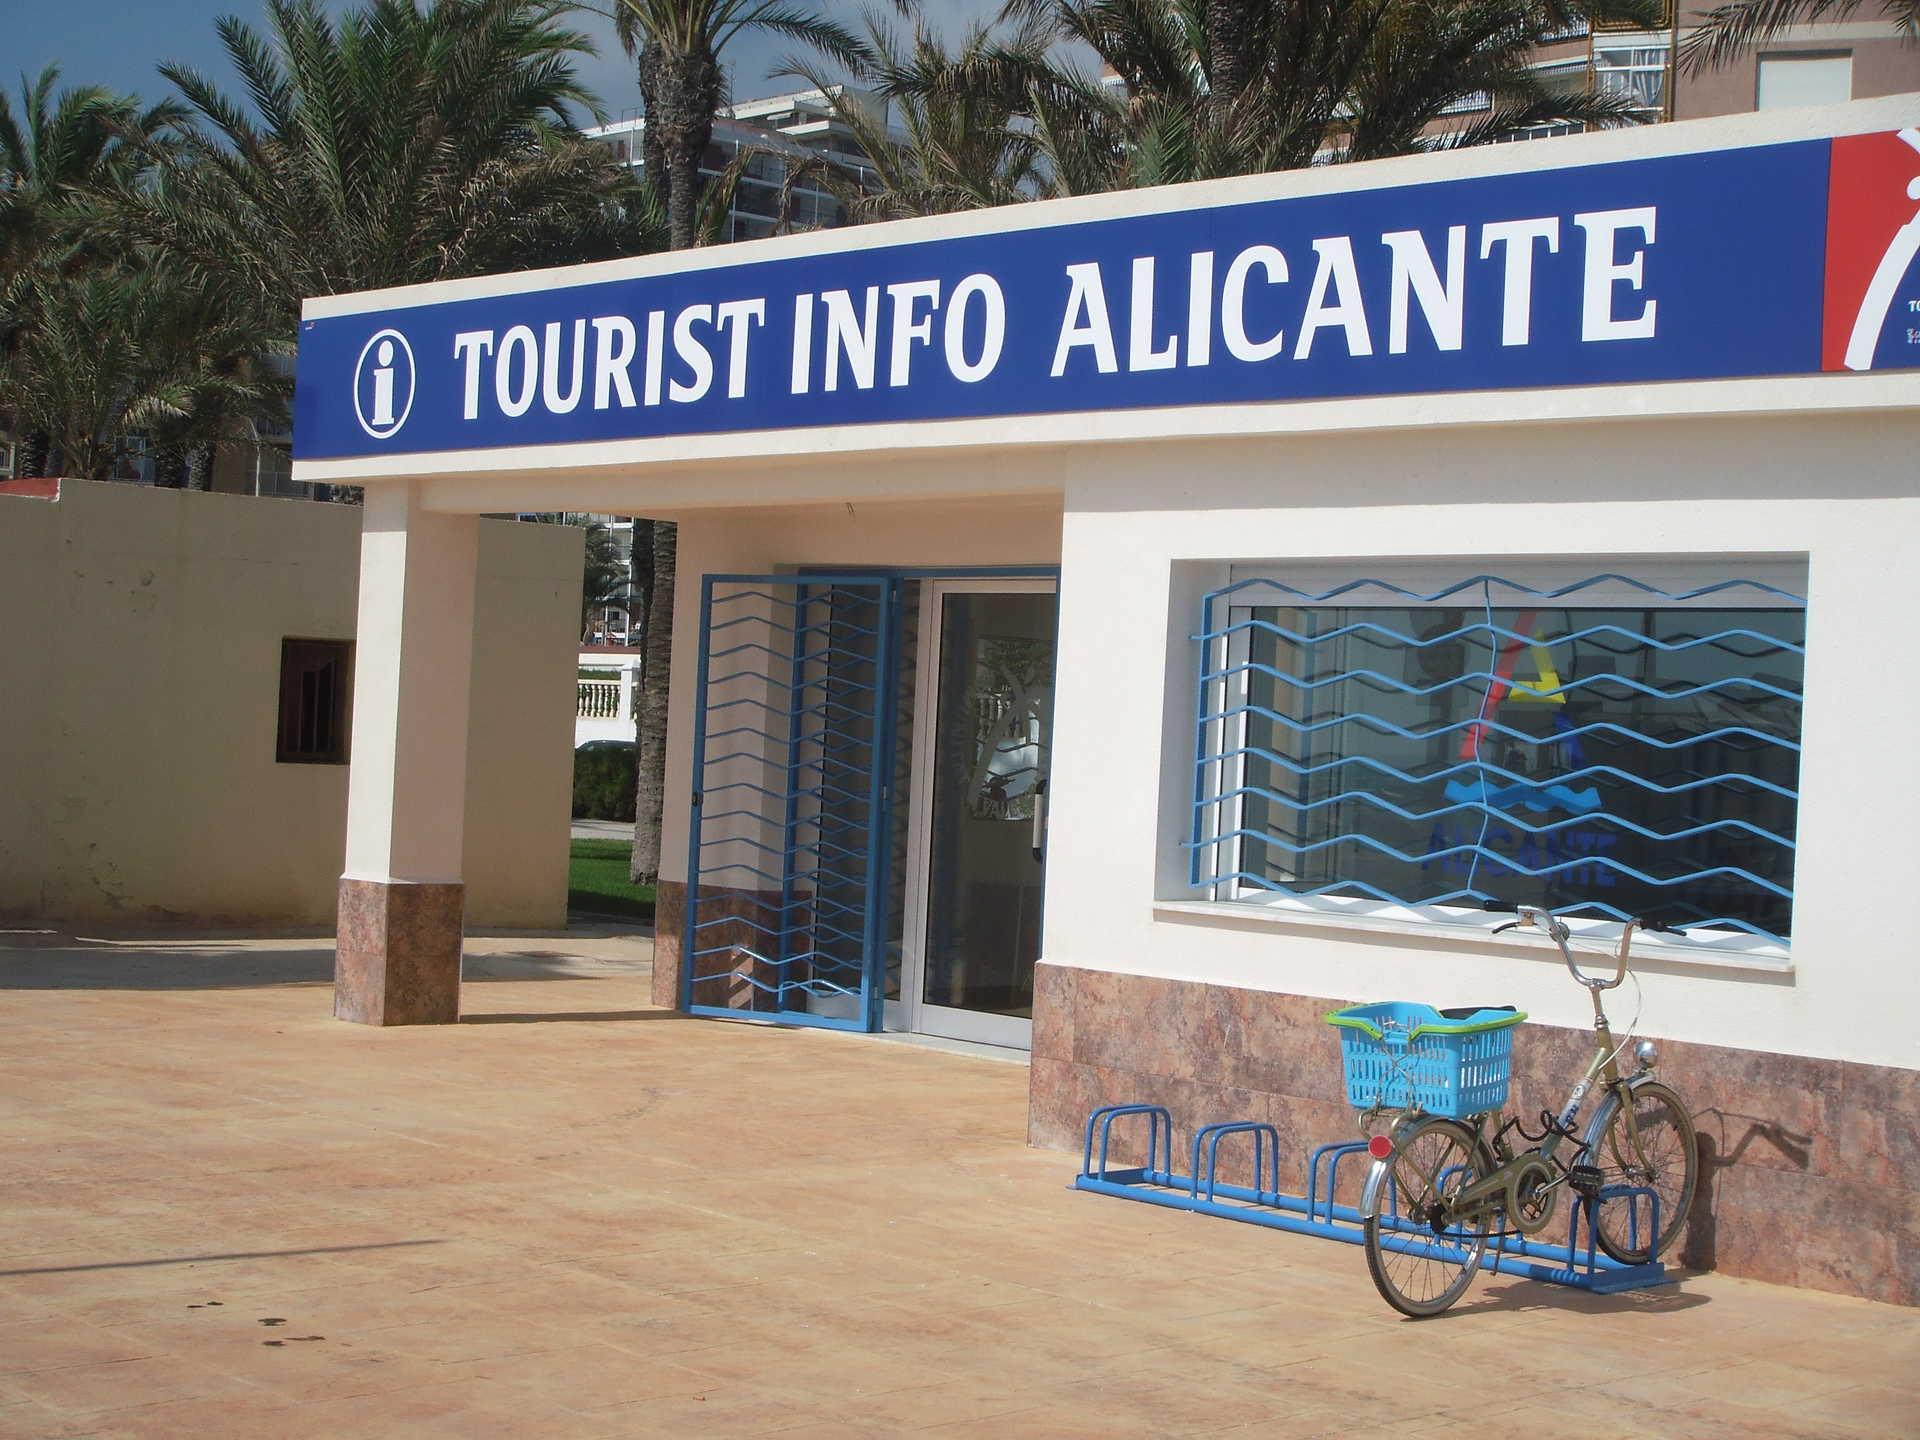 TOURIST INFO ALICANTE - PLAYA SAN JUAN